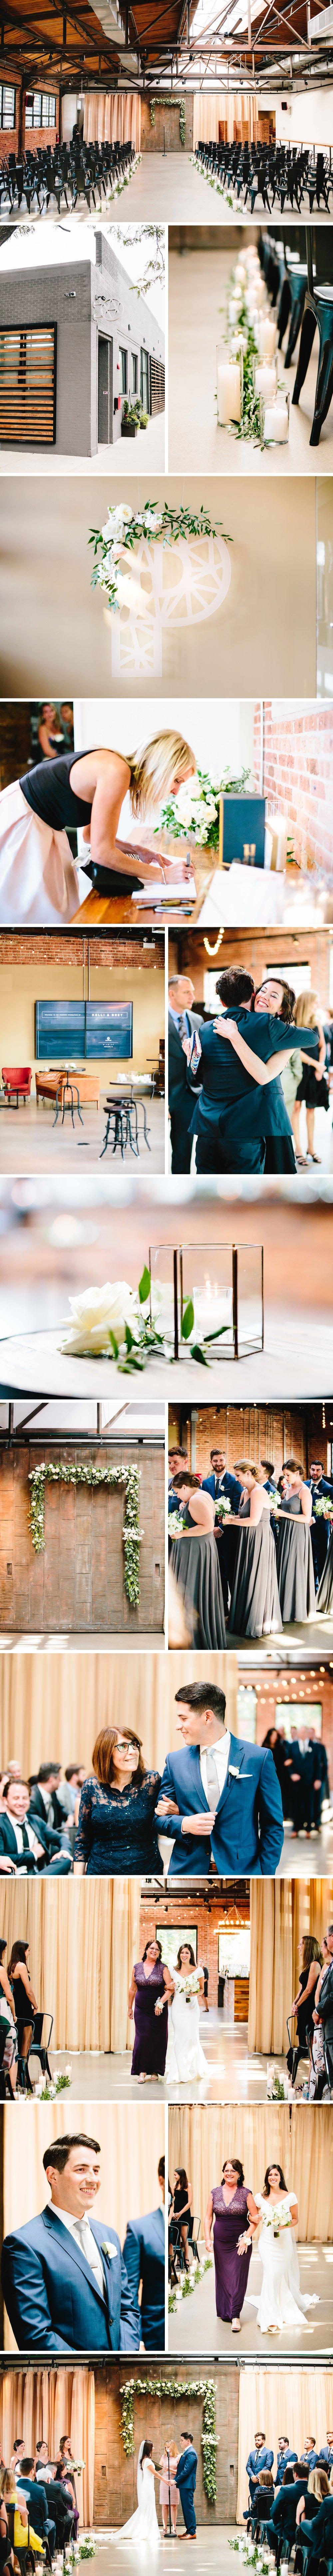 chicago-fine-art-wedding-photography-penninger6